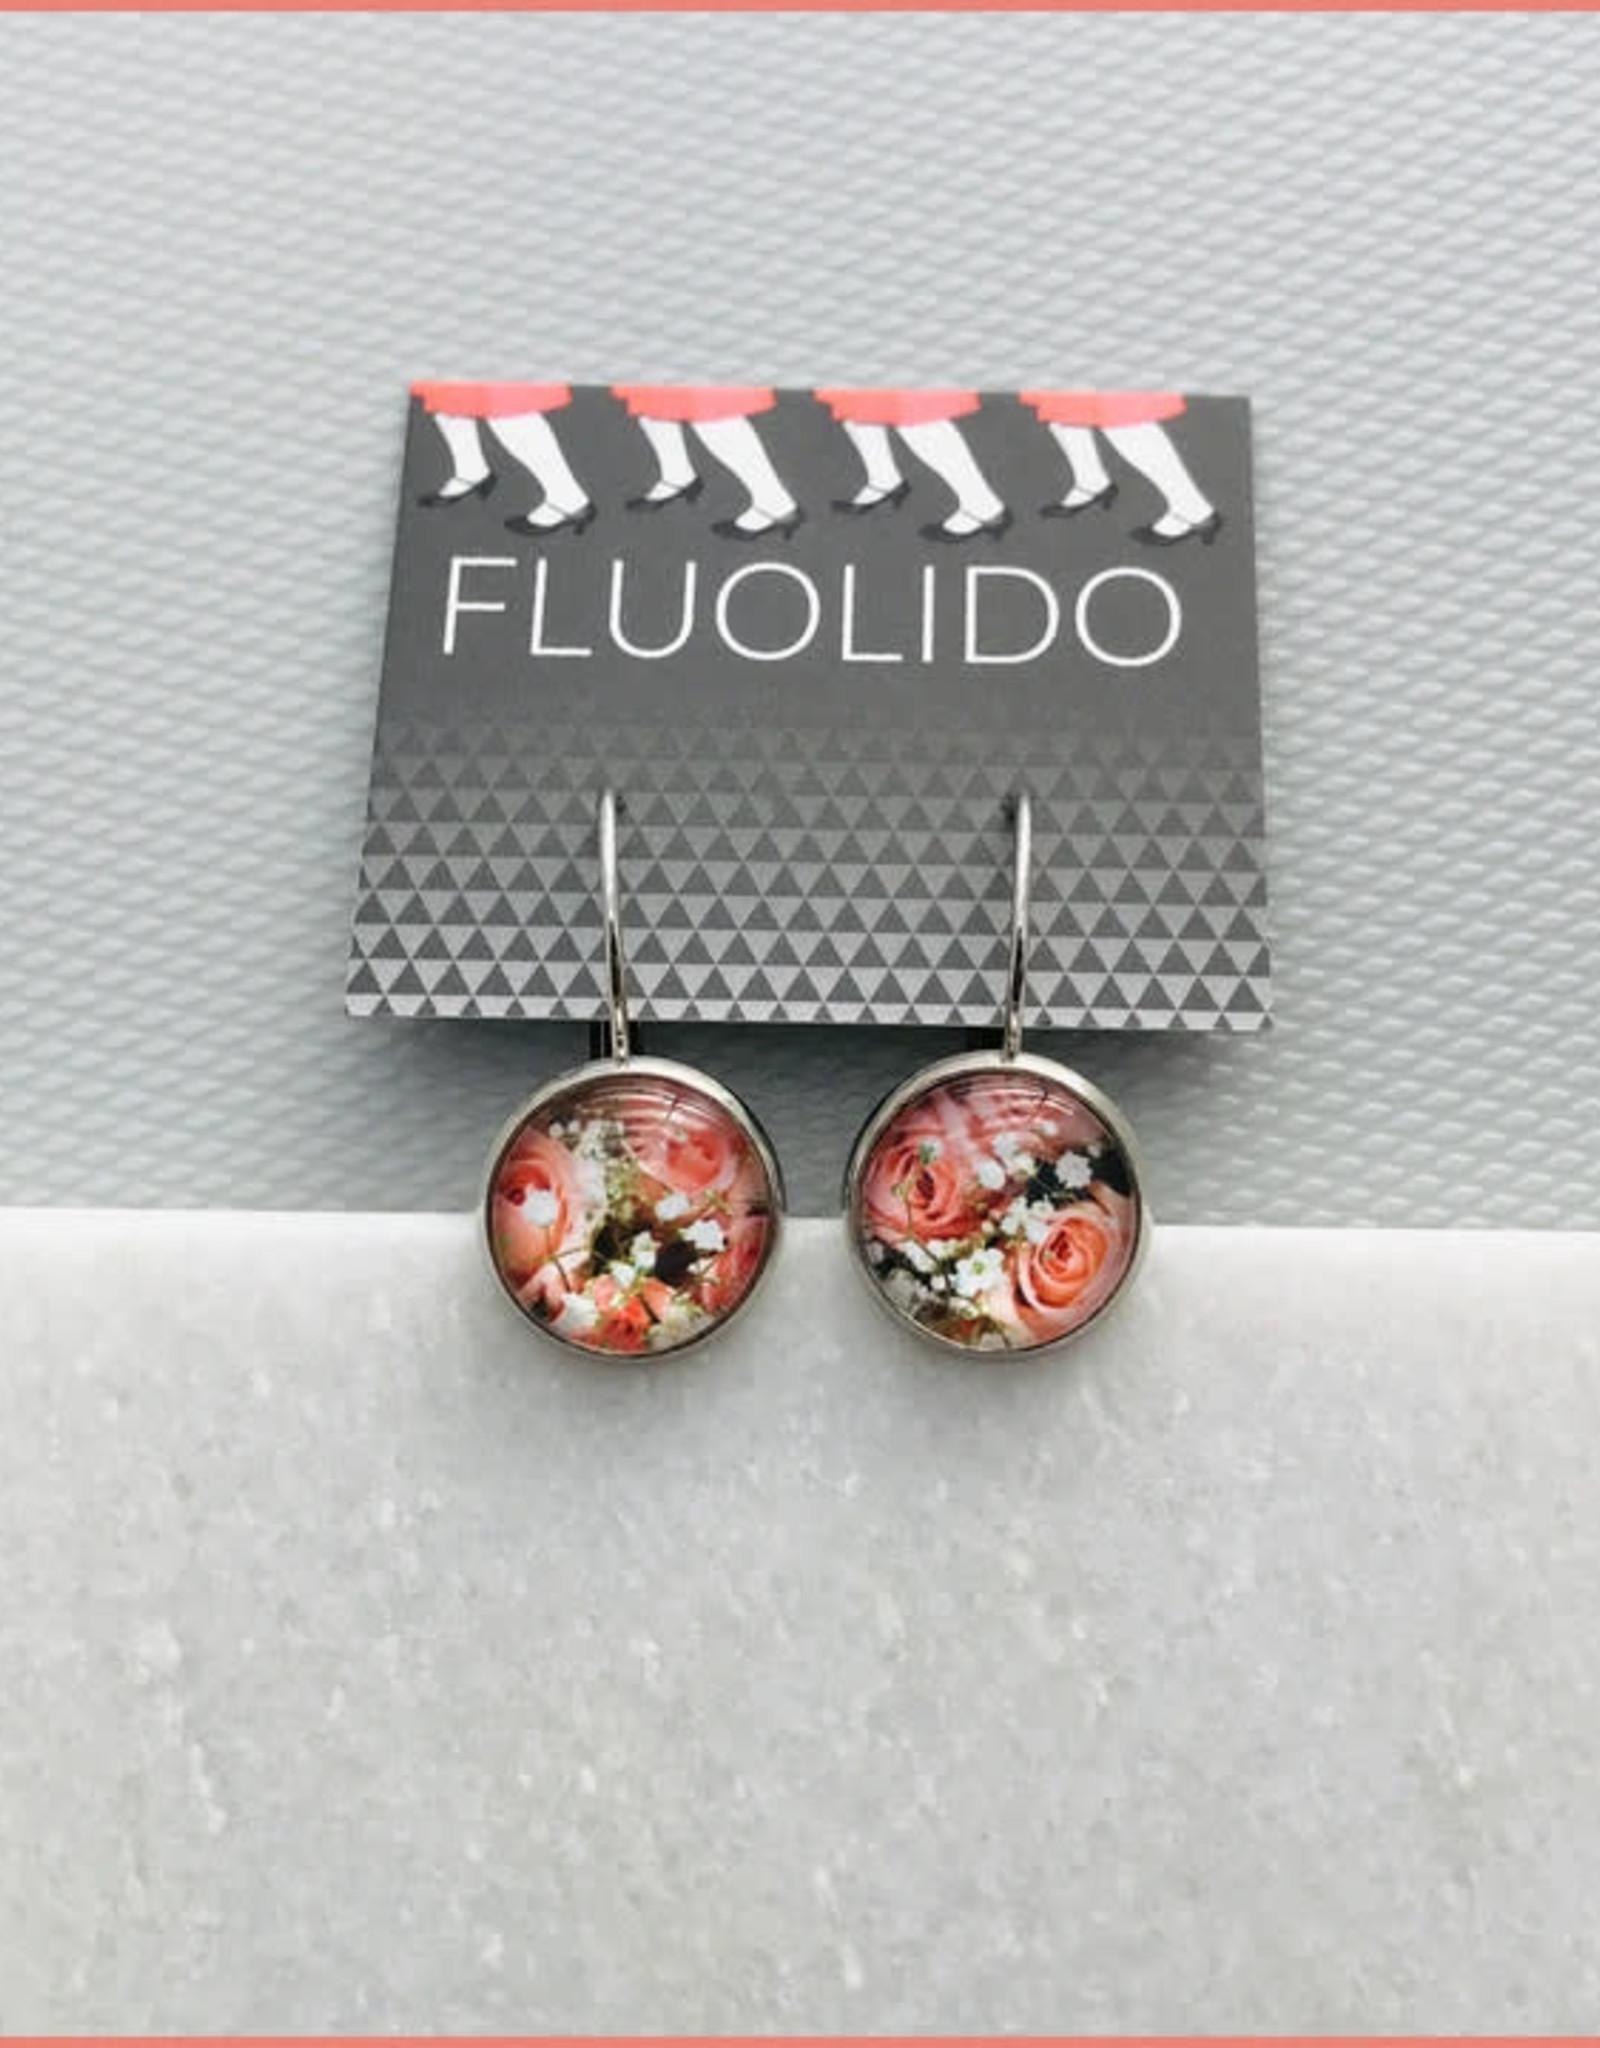 Fluolido Boucles d'oreilles Micro Fluolido Rose-ivoire